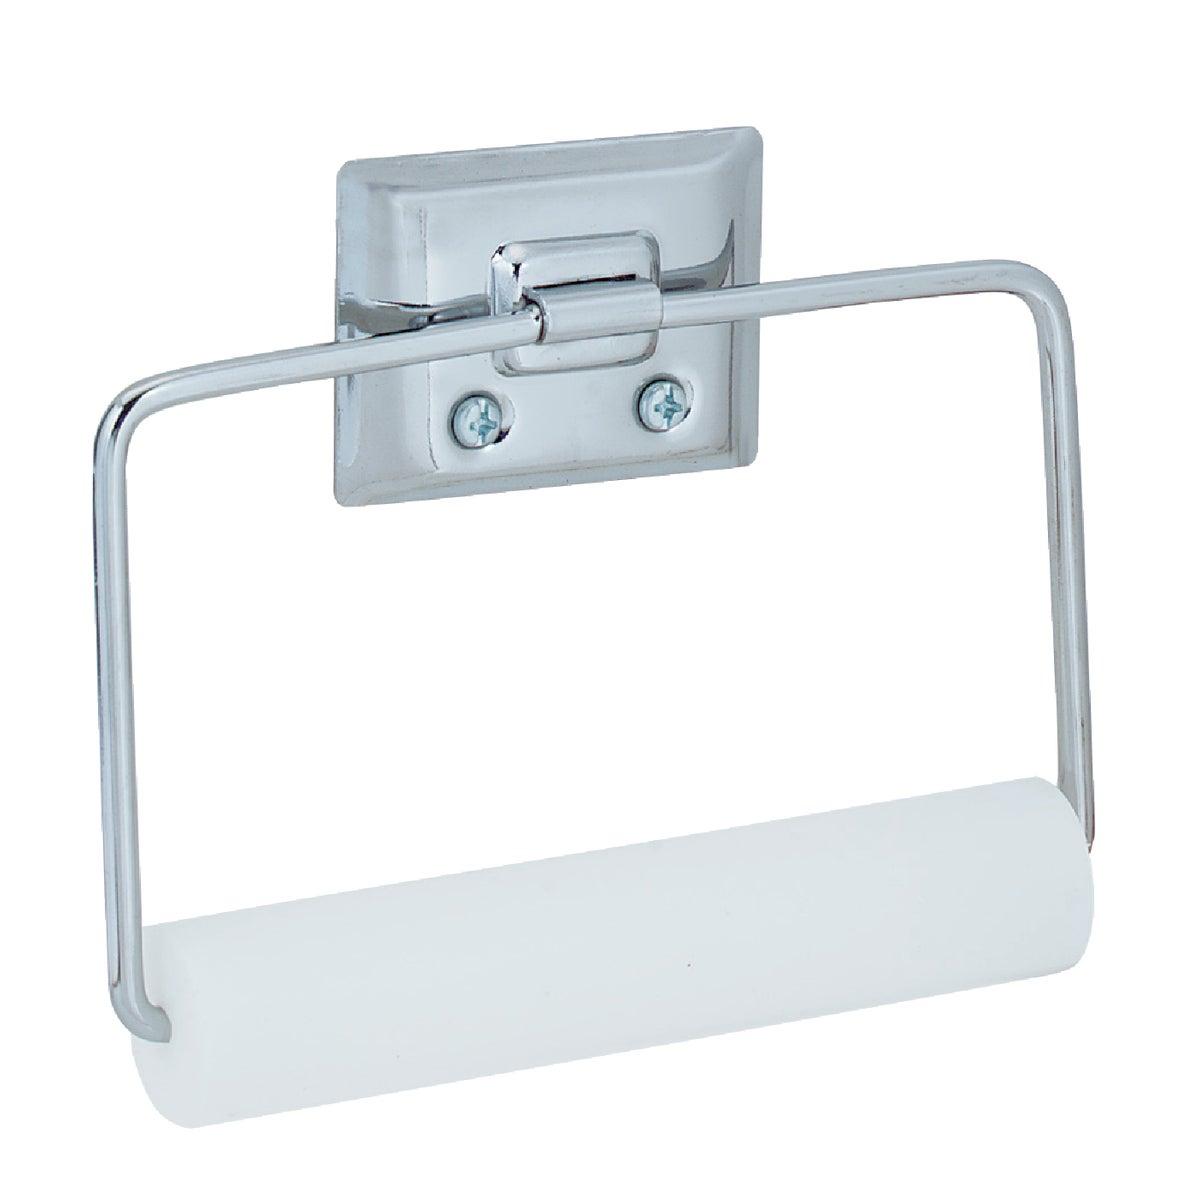 Decko Bath CHROME PAPER HOLDER 38090